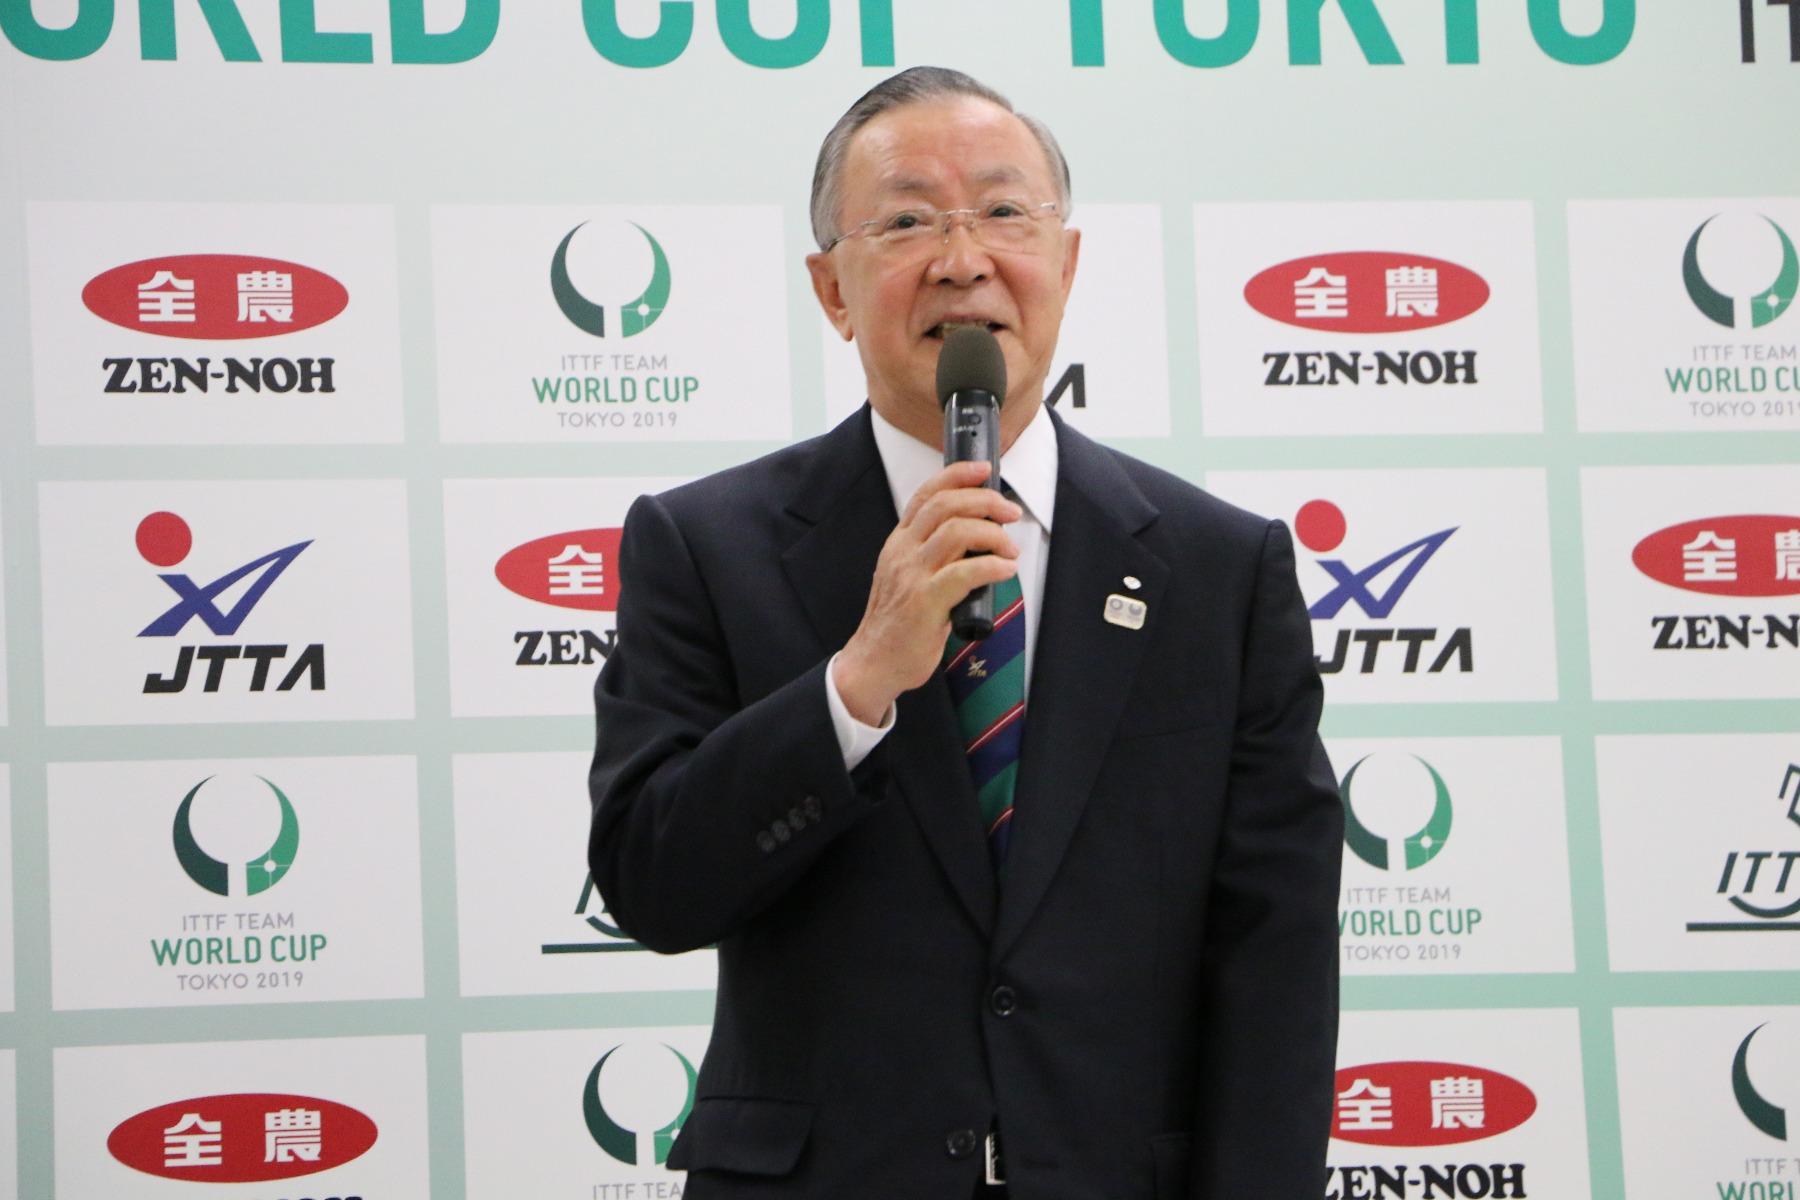 JA全農 チームワールドカップ 東京大会 開催記者発表 会見 藤重貞慶